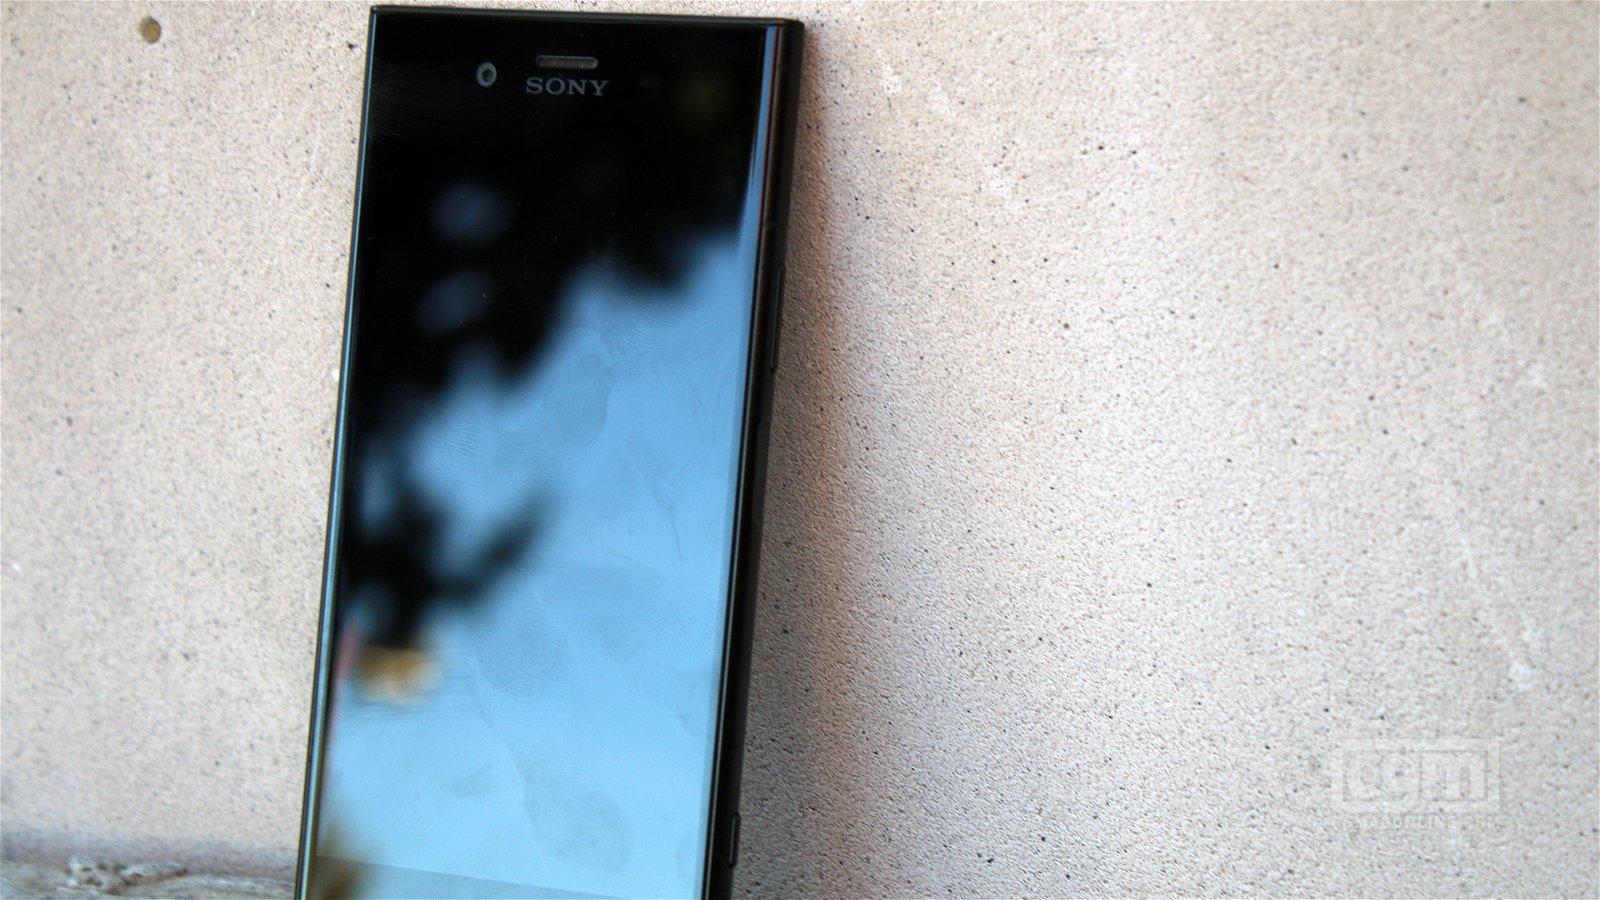 Sony Xperia XZ1 (Smartphone) Review – Boringly Great